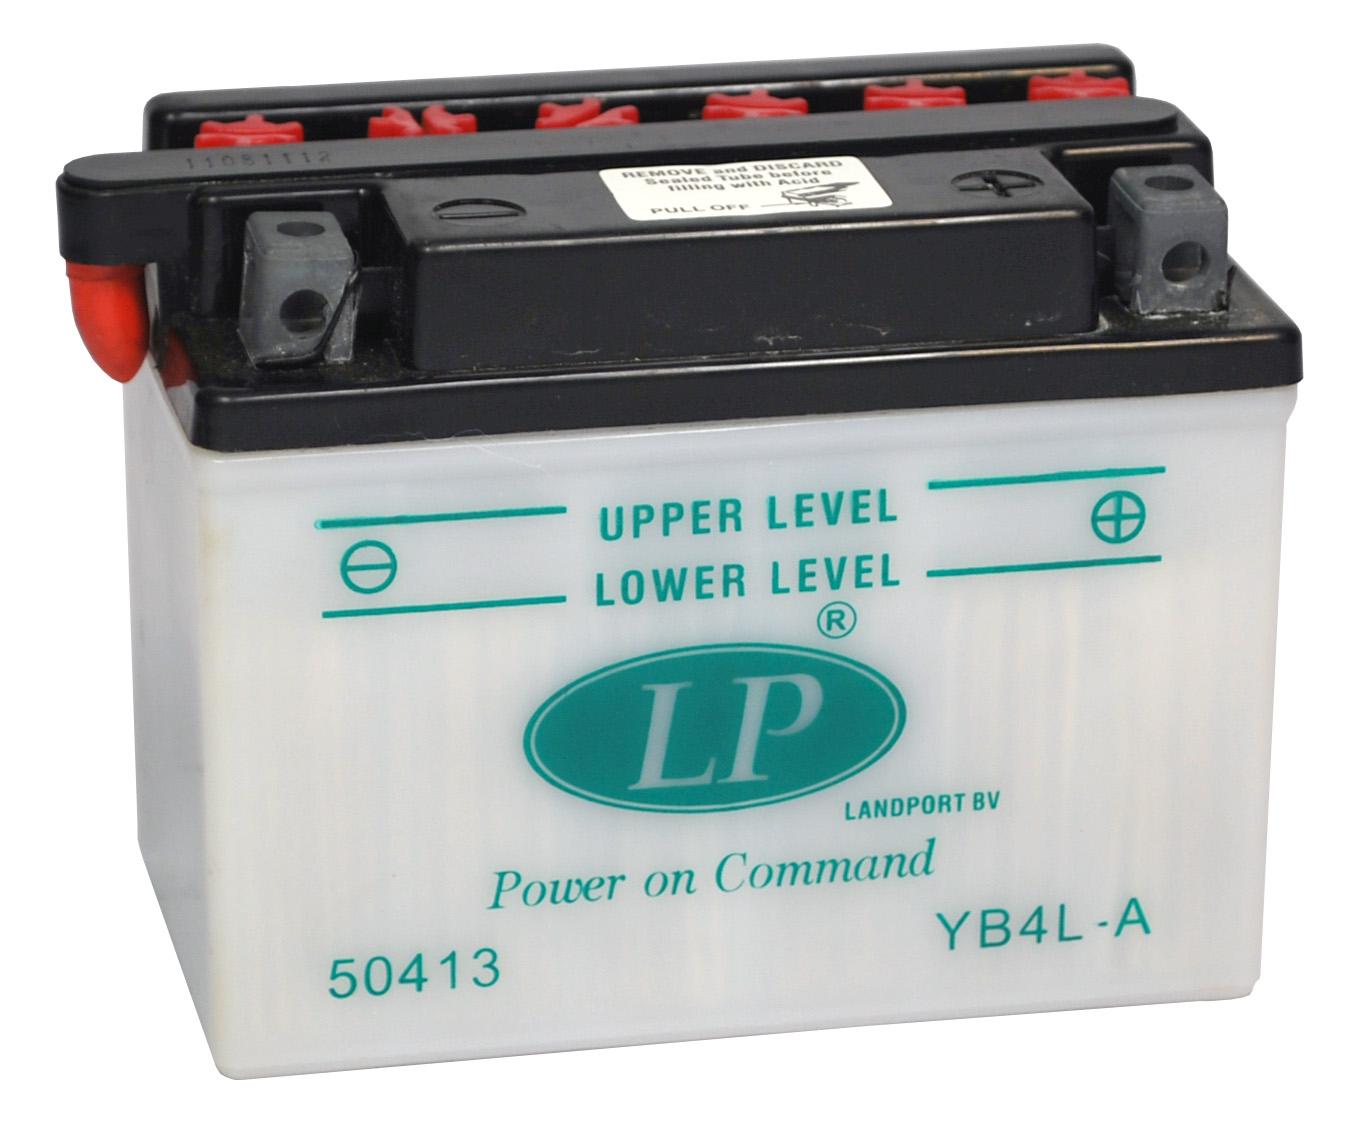 YB4L-A motor accu zonder zuurpakket